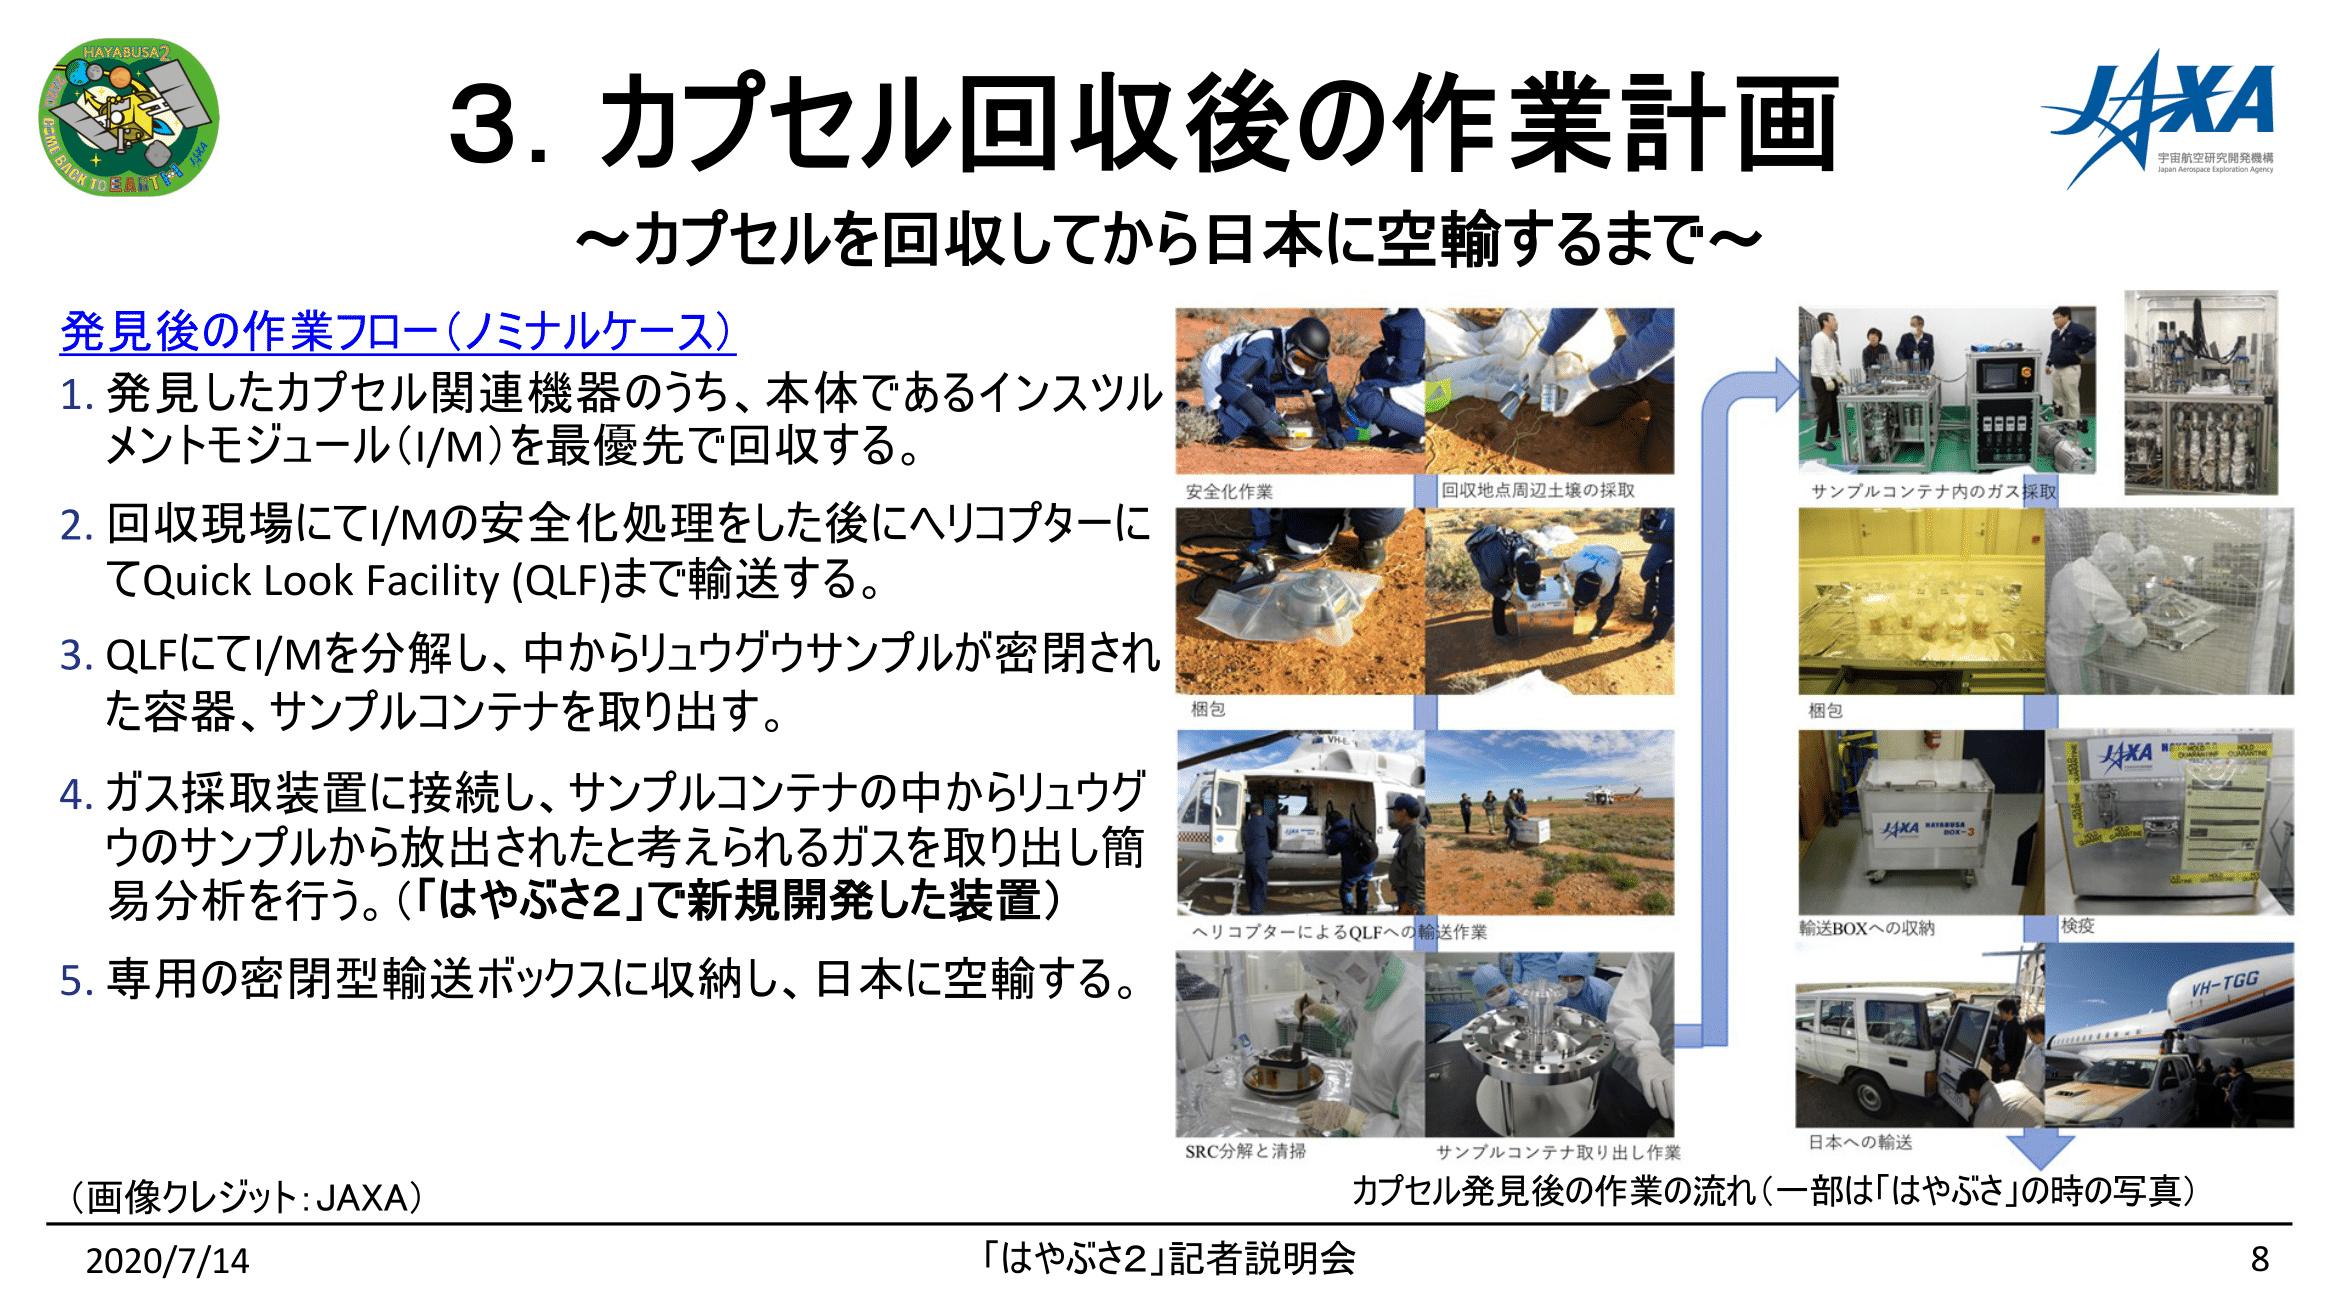 f:id:Imamura:20201116150825j:plain